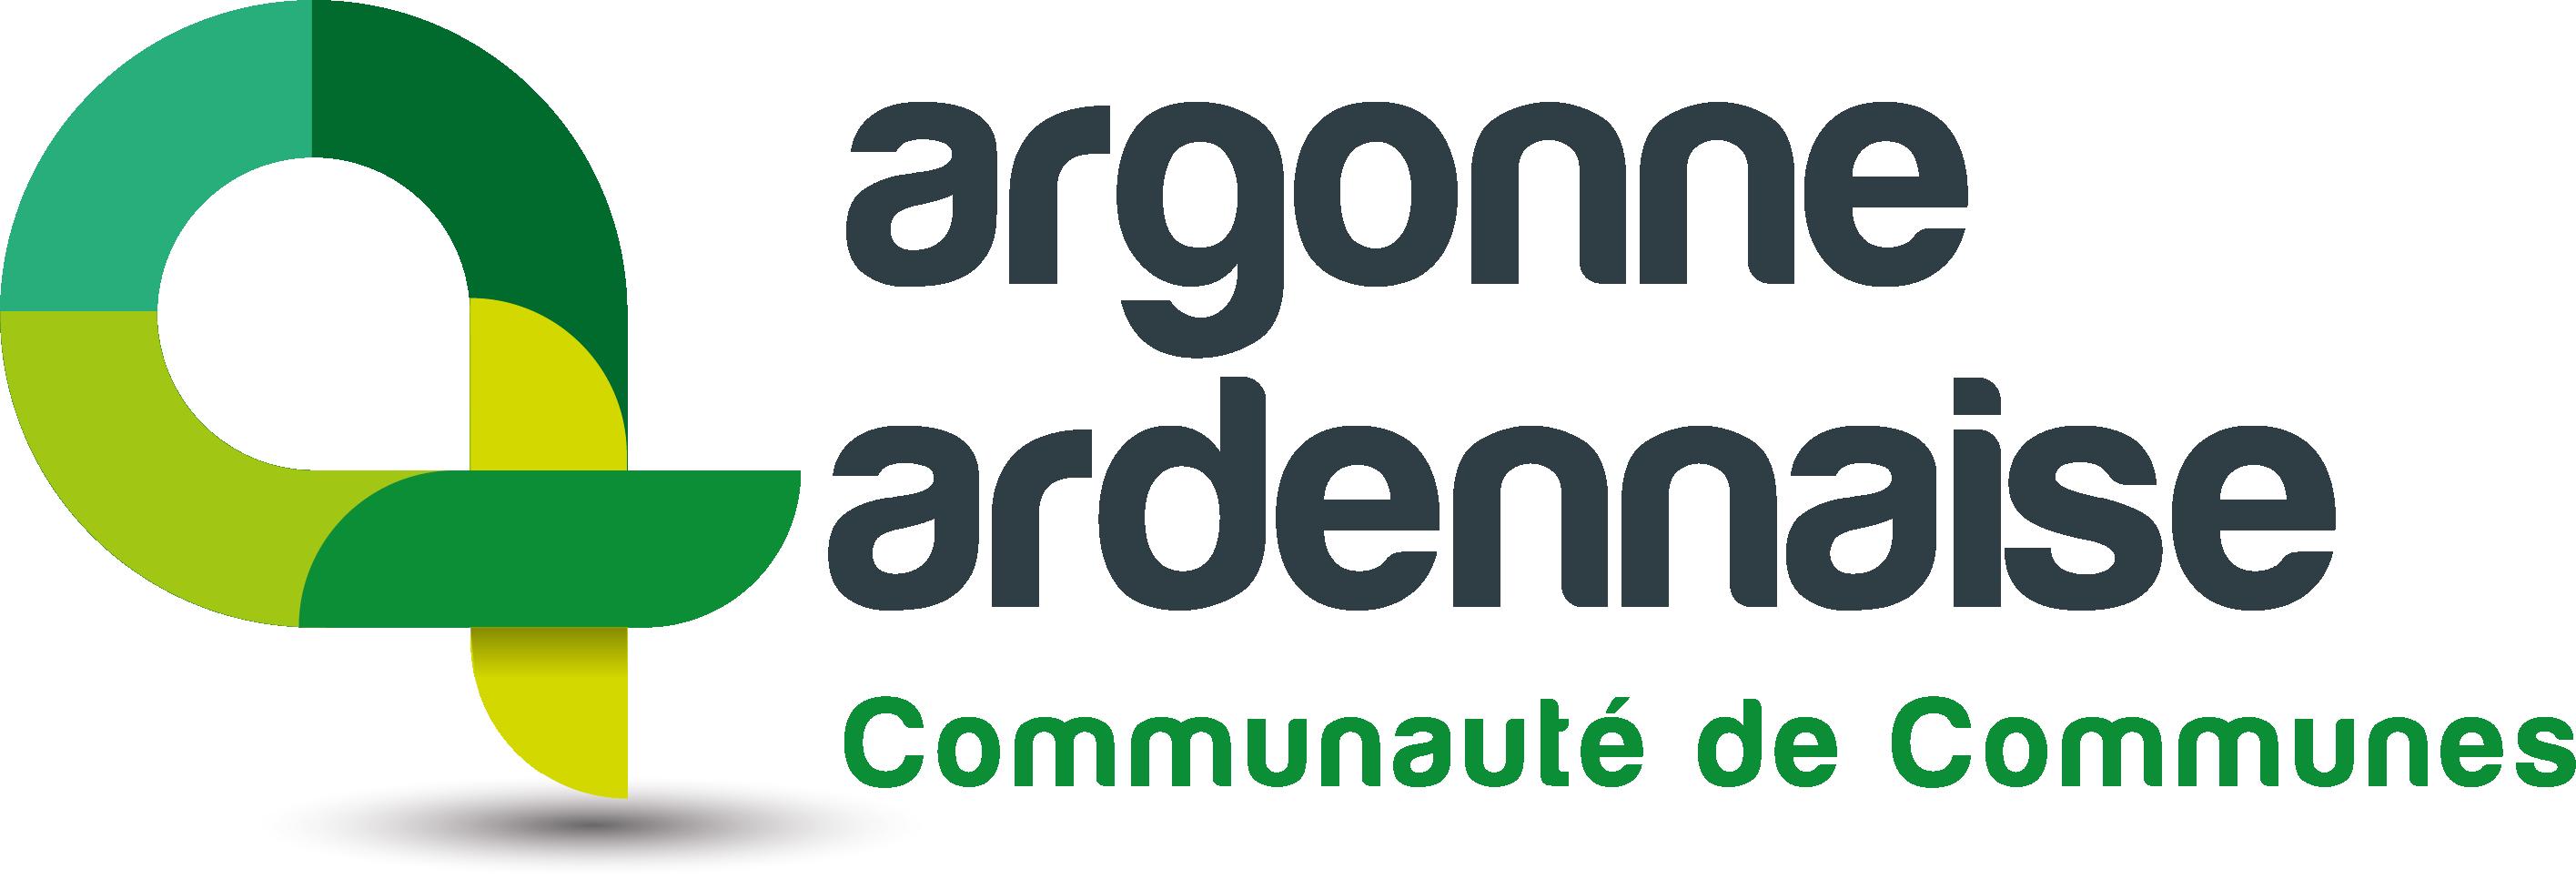 Logo Argonne Ardennaise